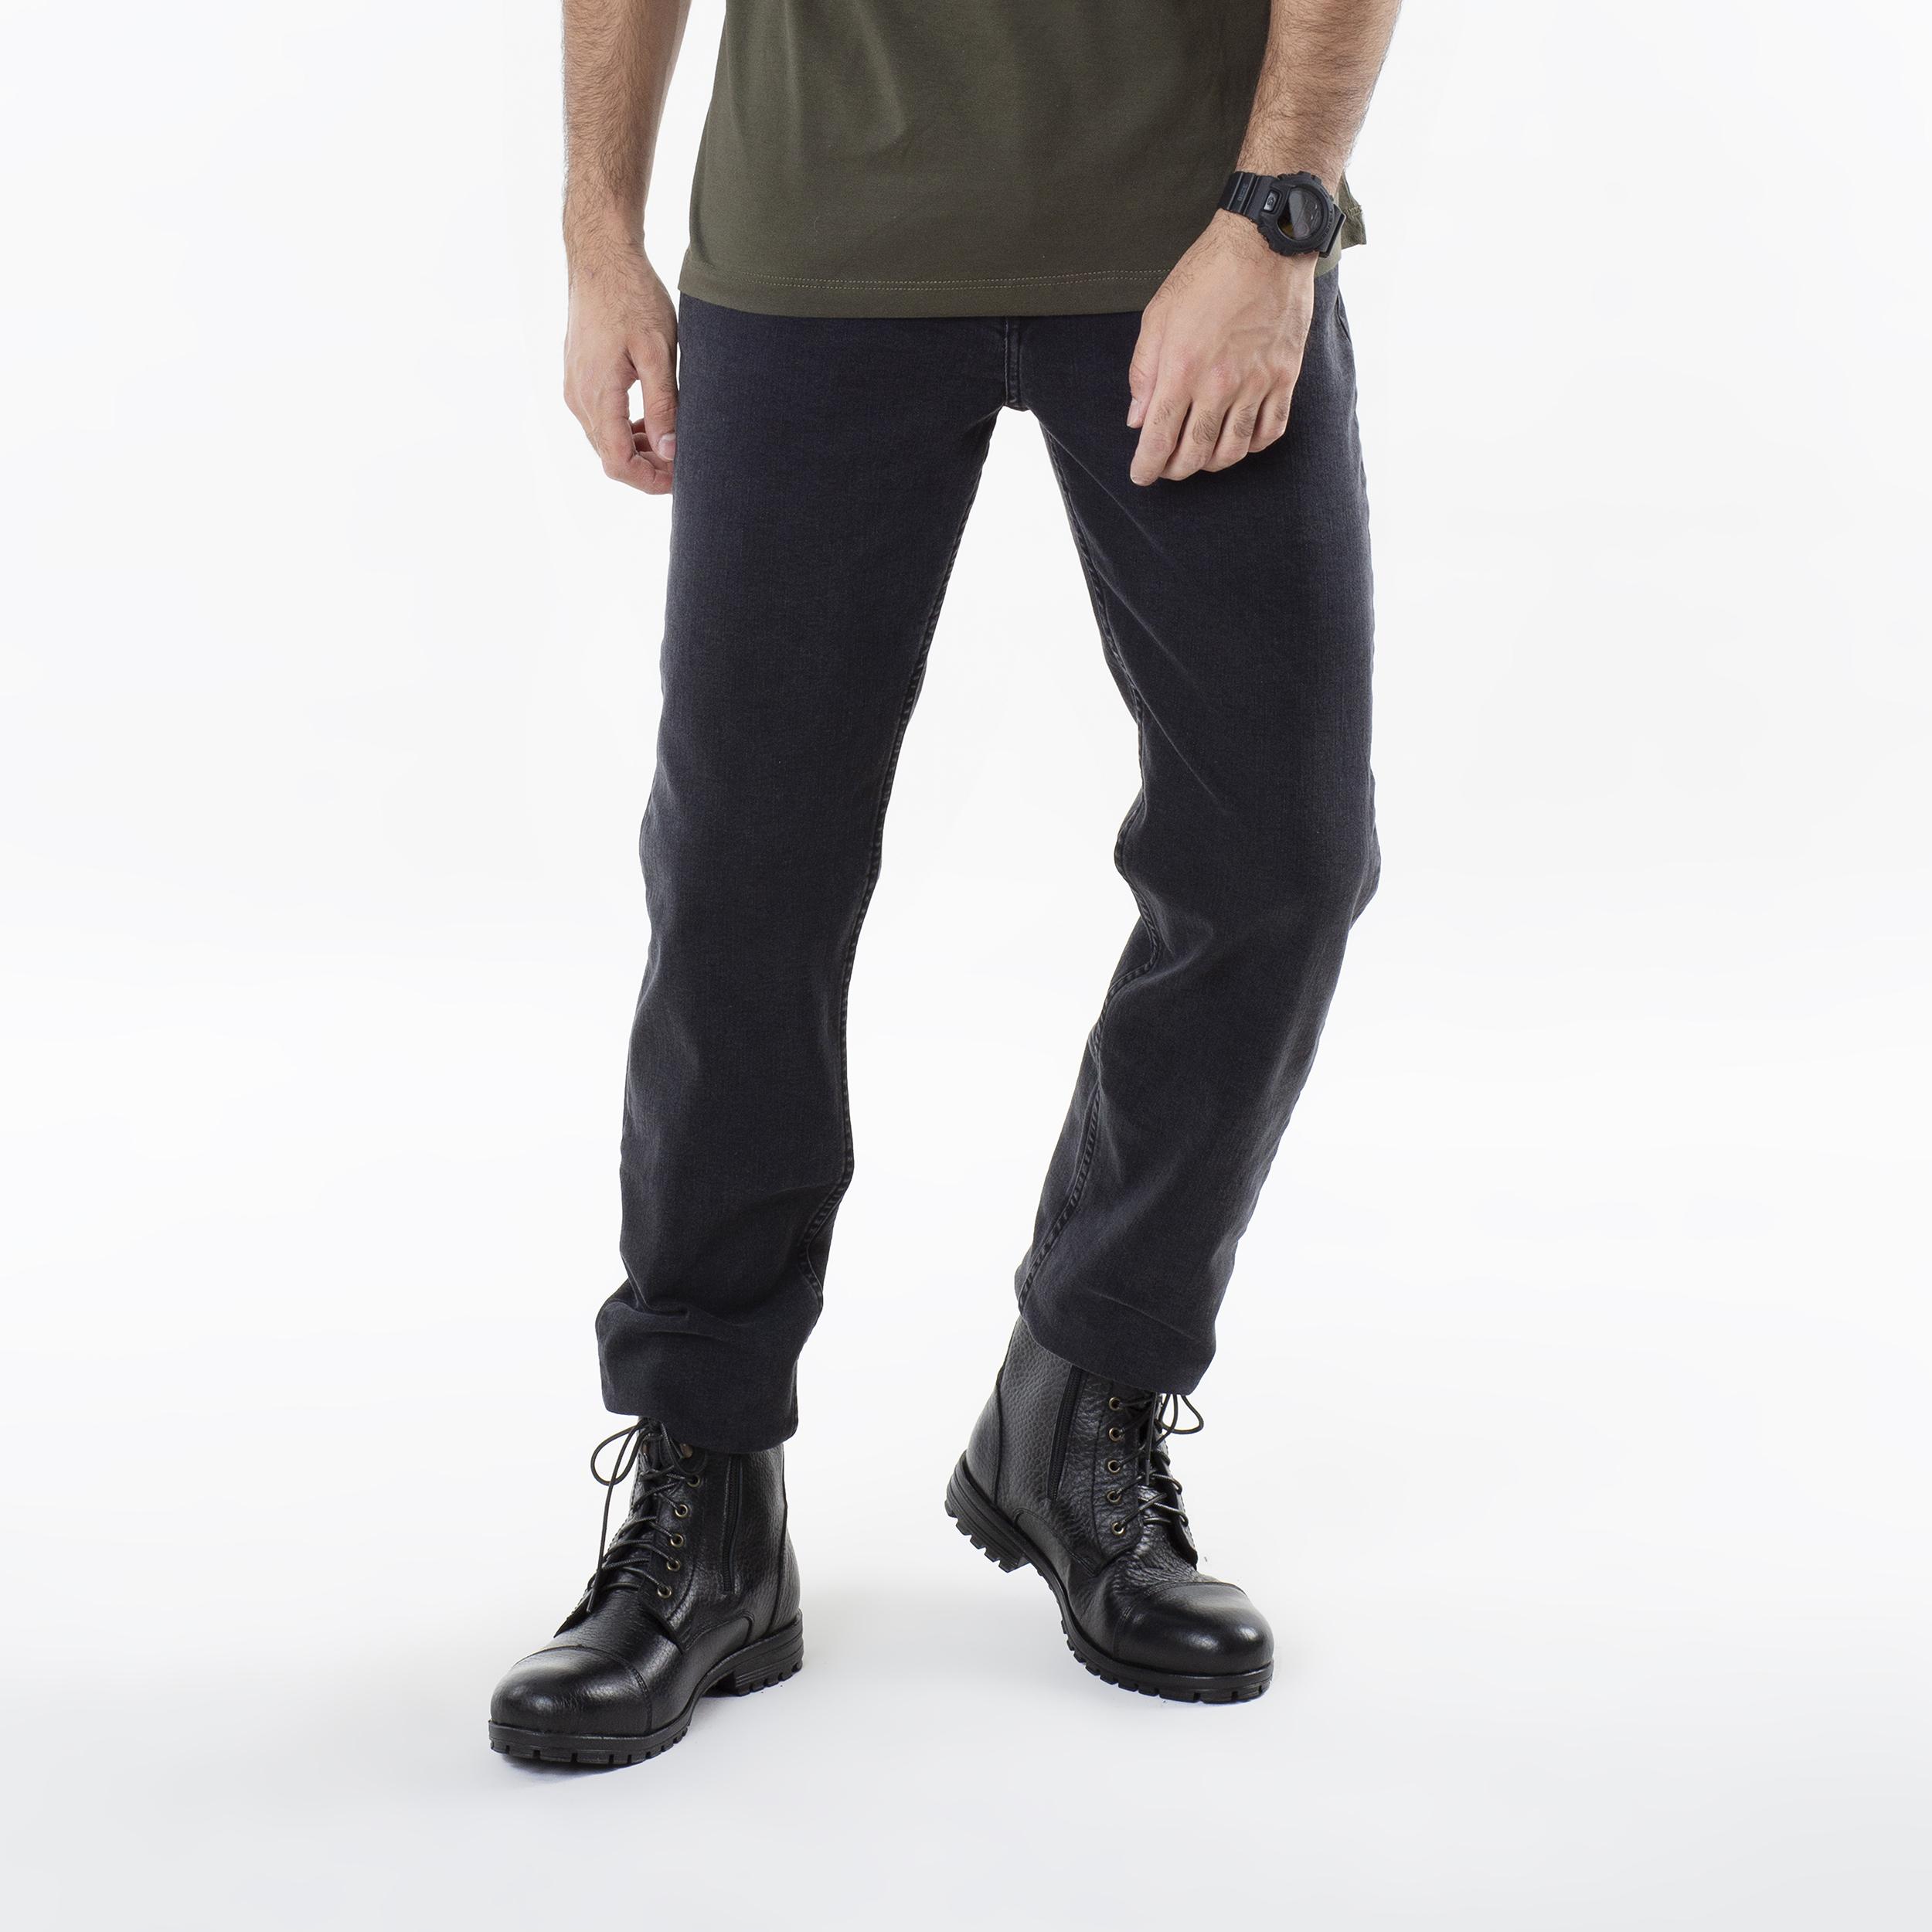 شلوار جین مردانه ال سی من مدل 01317062-CHARCOAL